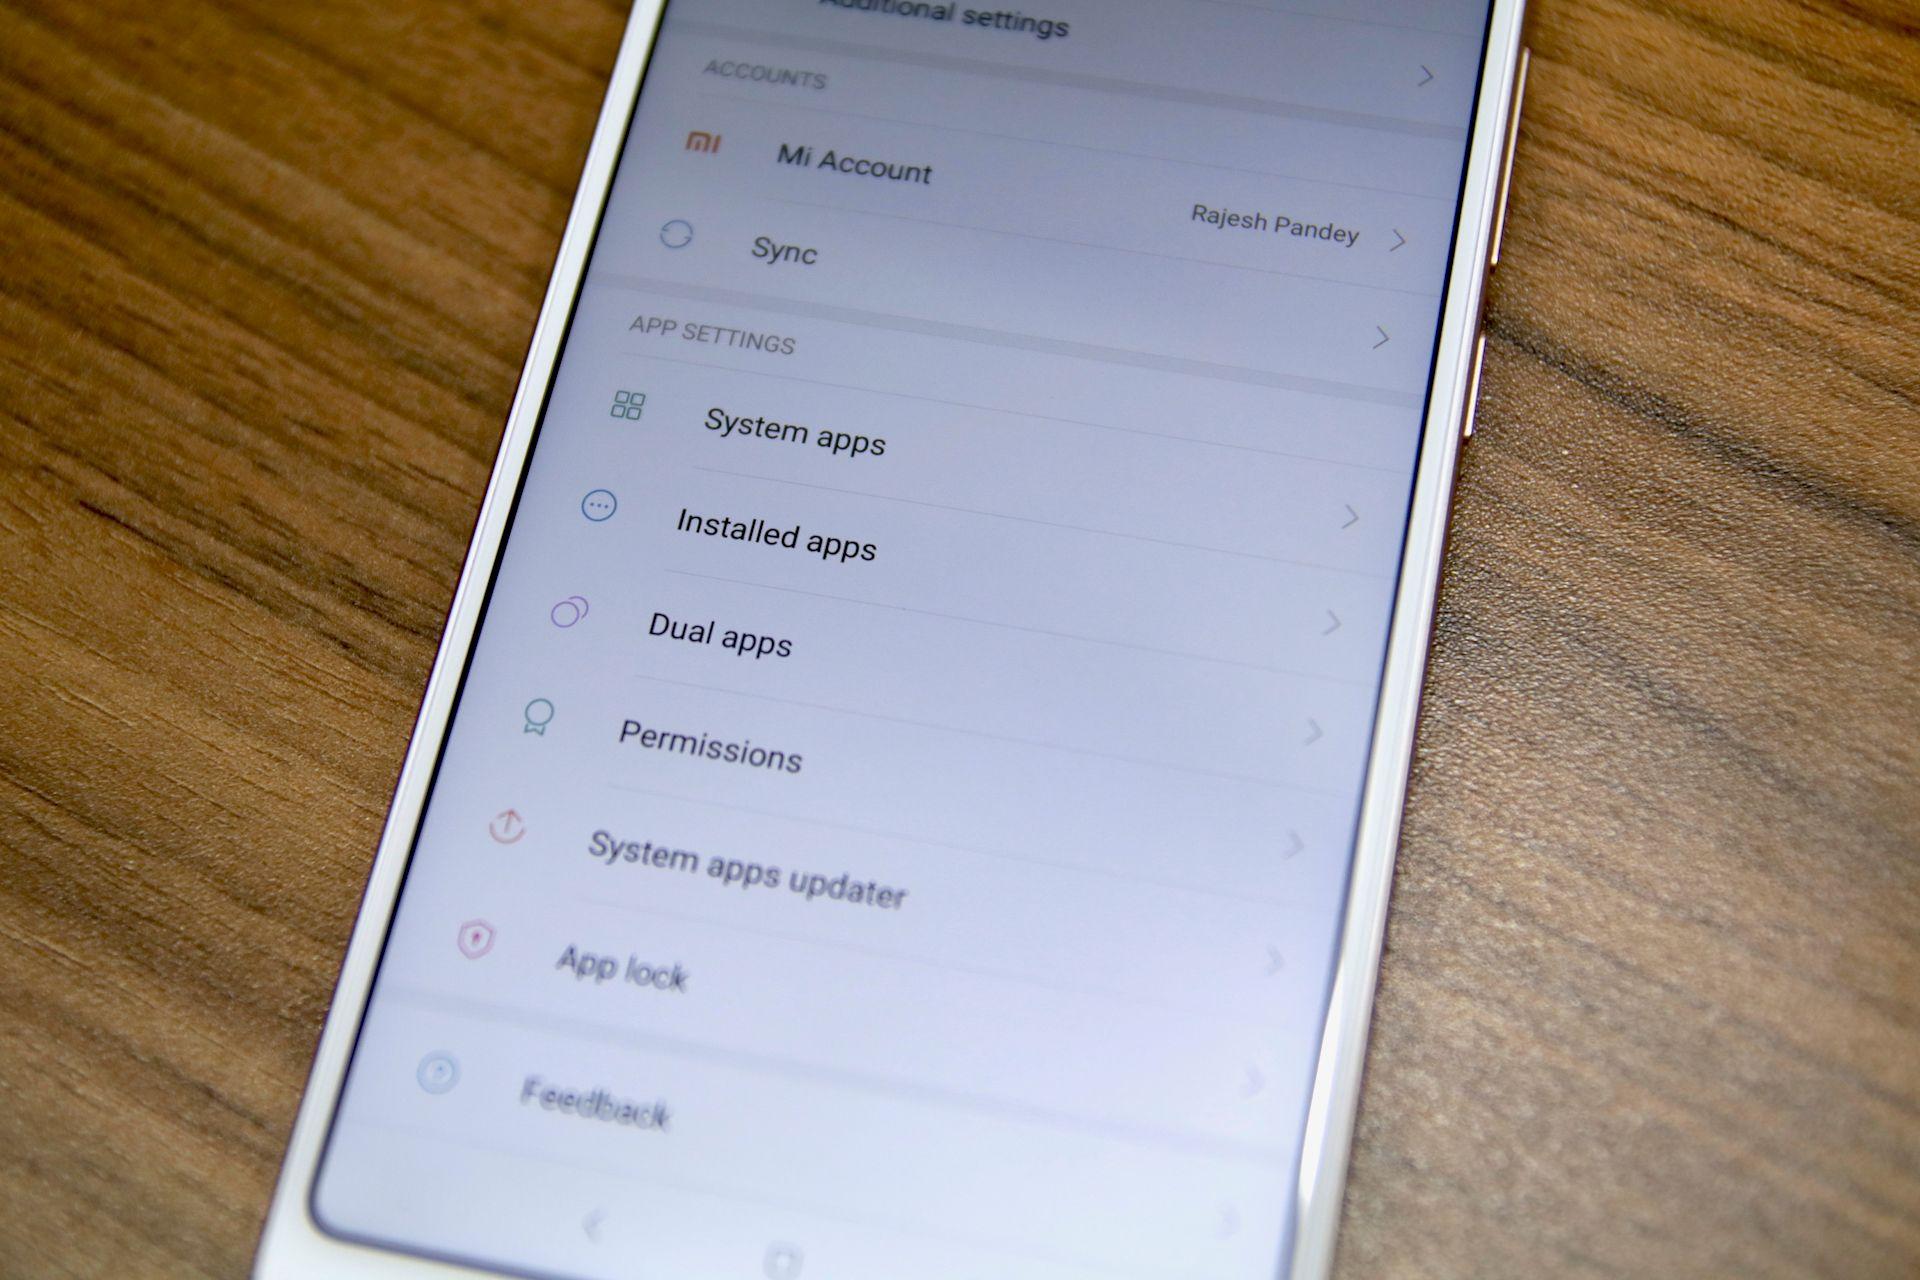 Redmi Note 5, Redmi Note 5 Pro: Top Hidden Features You Should Have